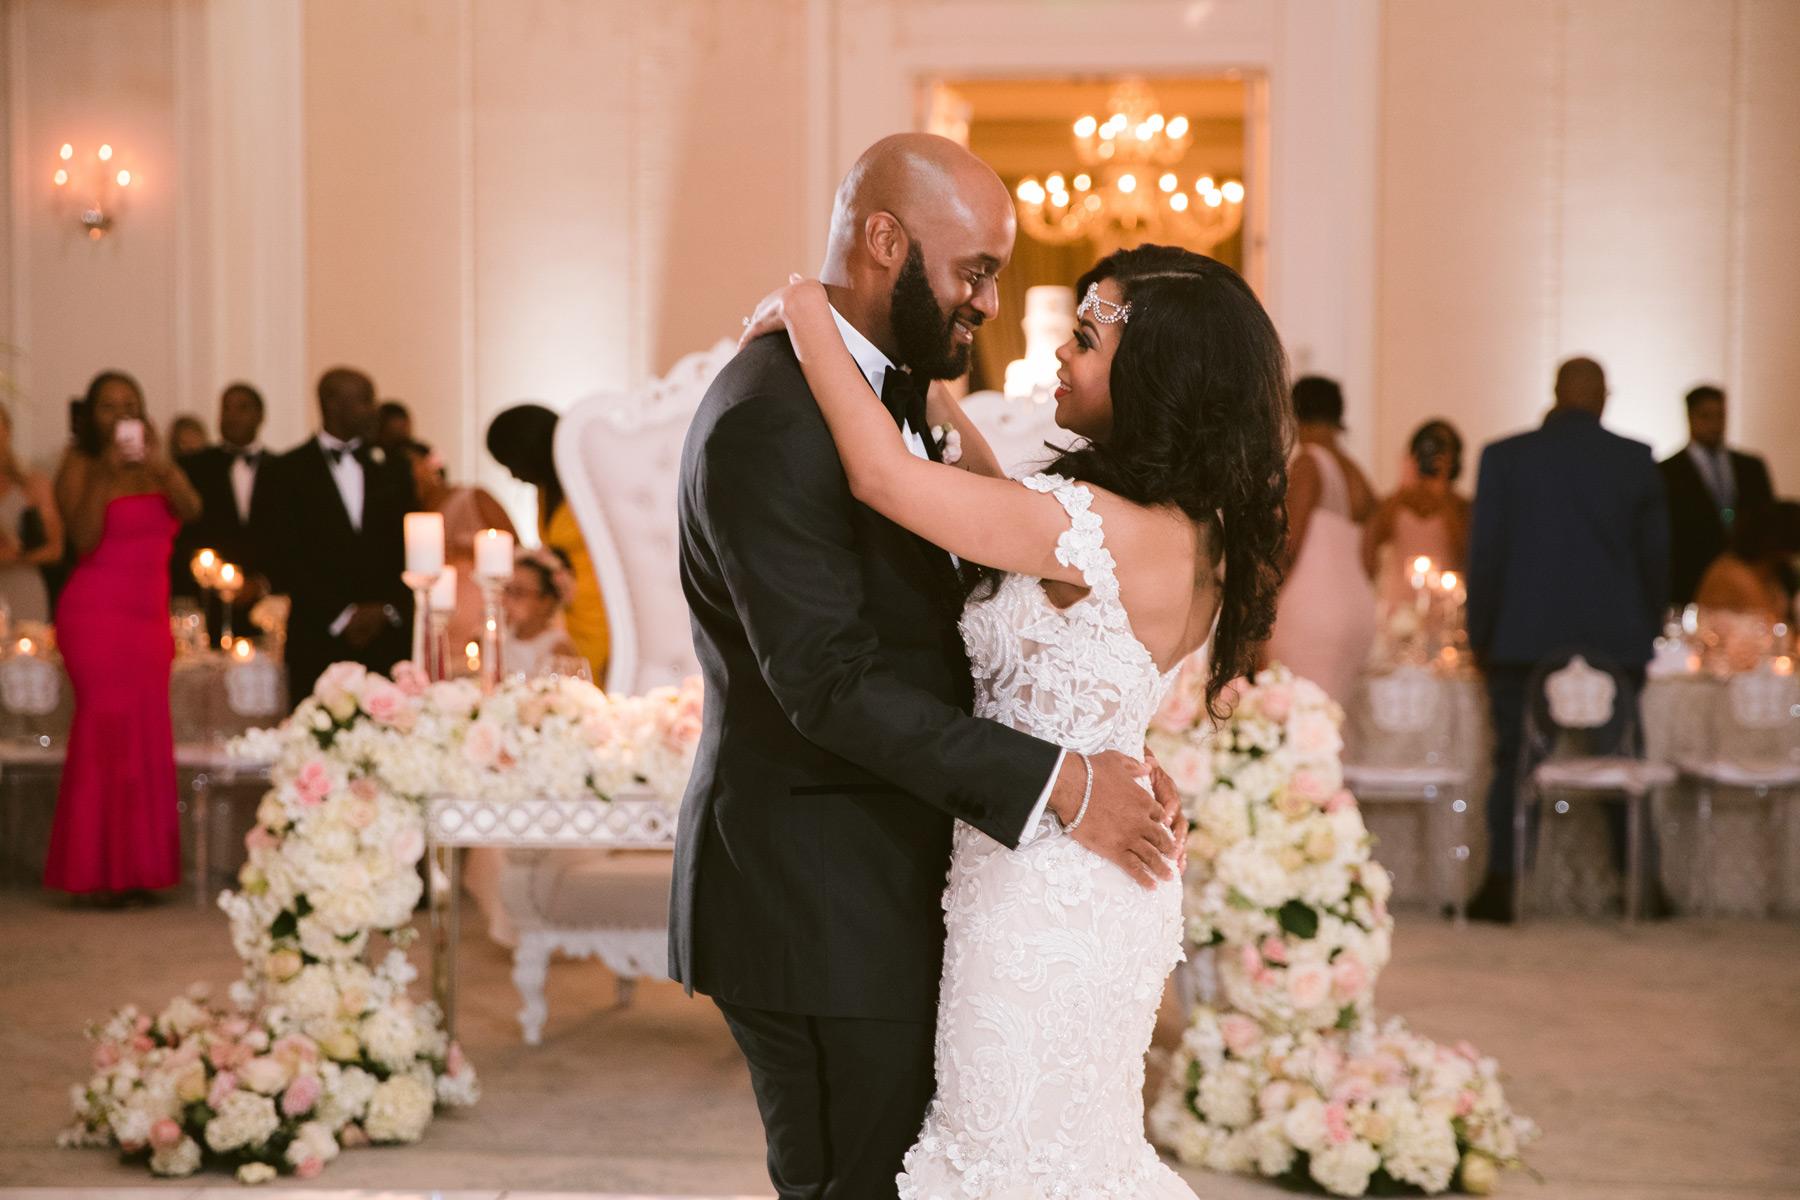 St-Regis-Wedding-Atlanta-0914-0069